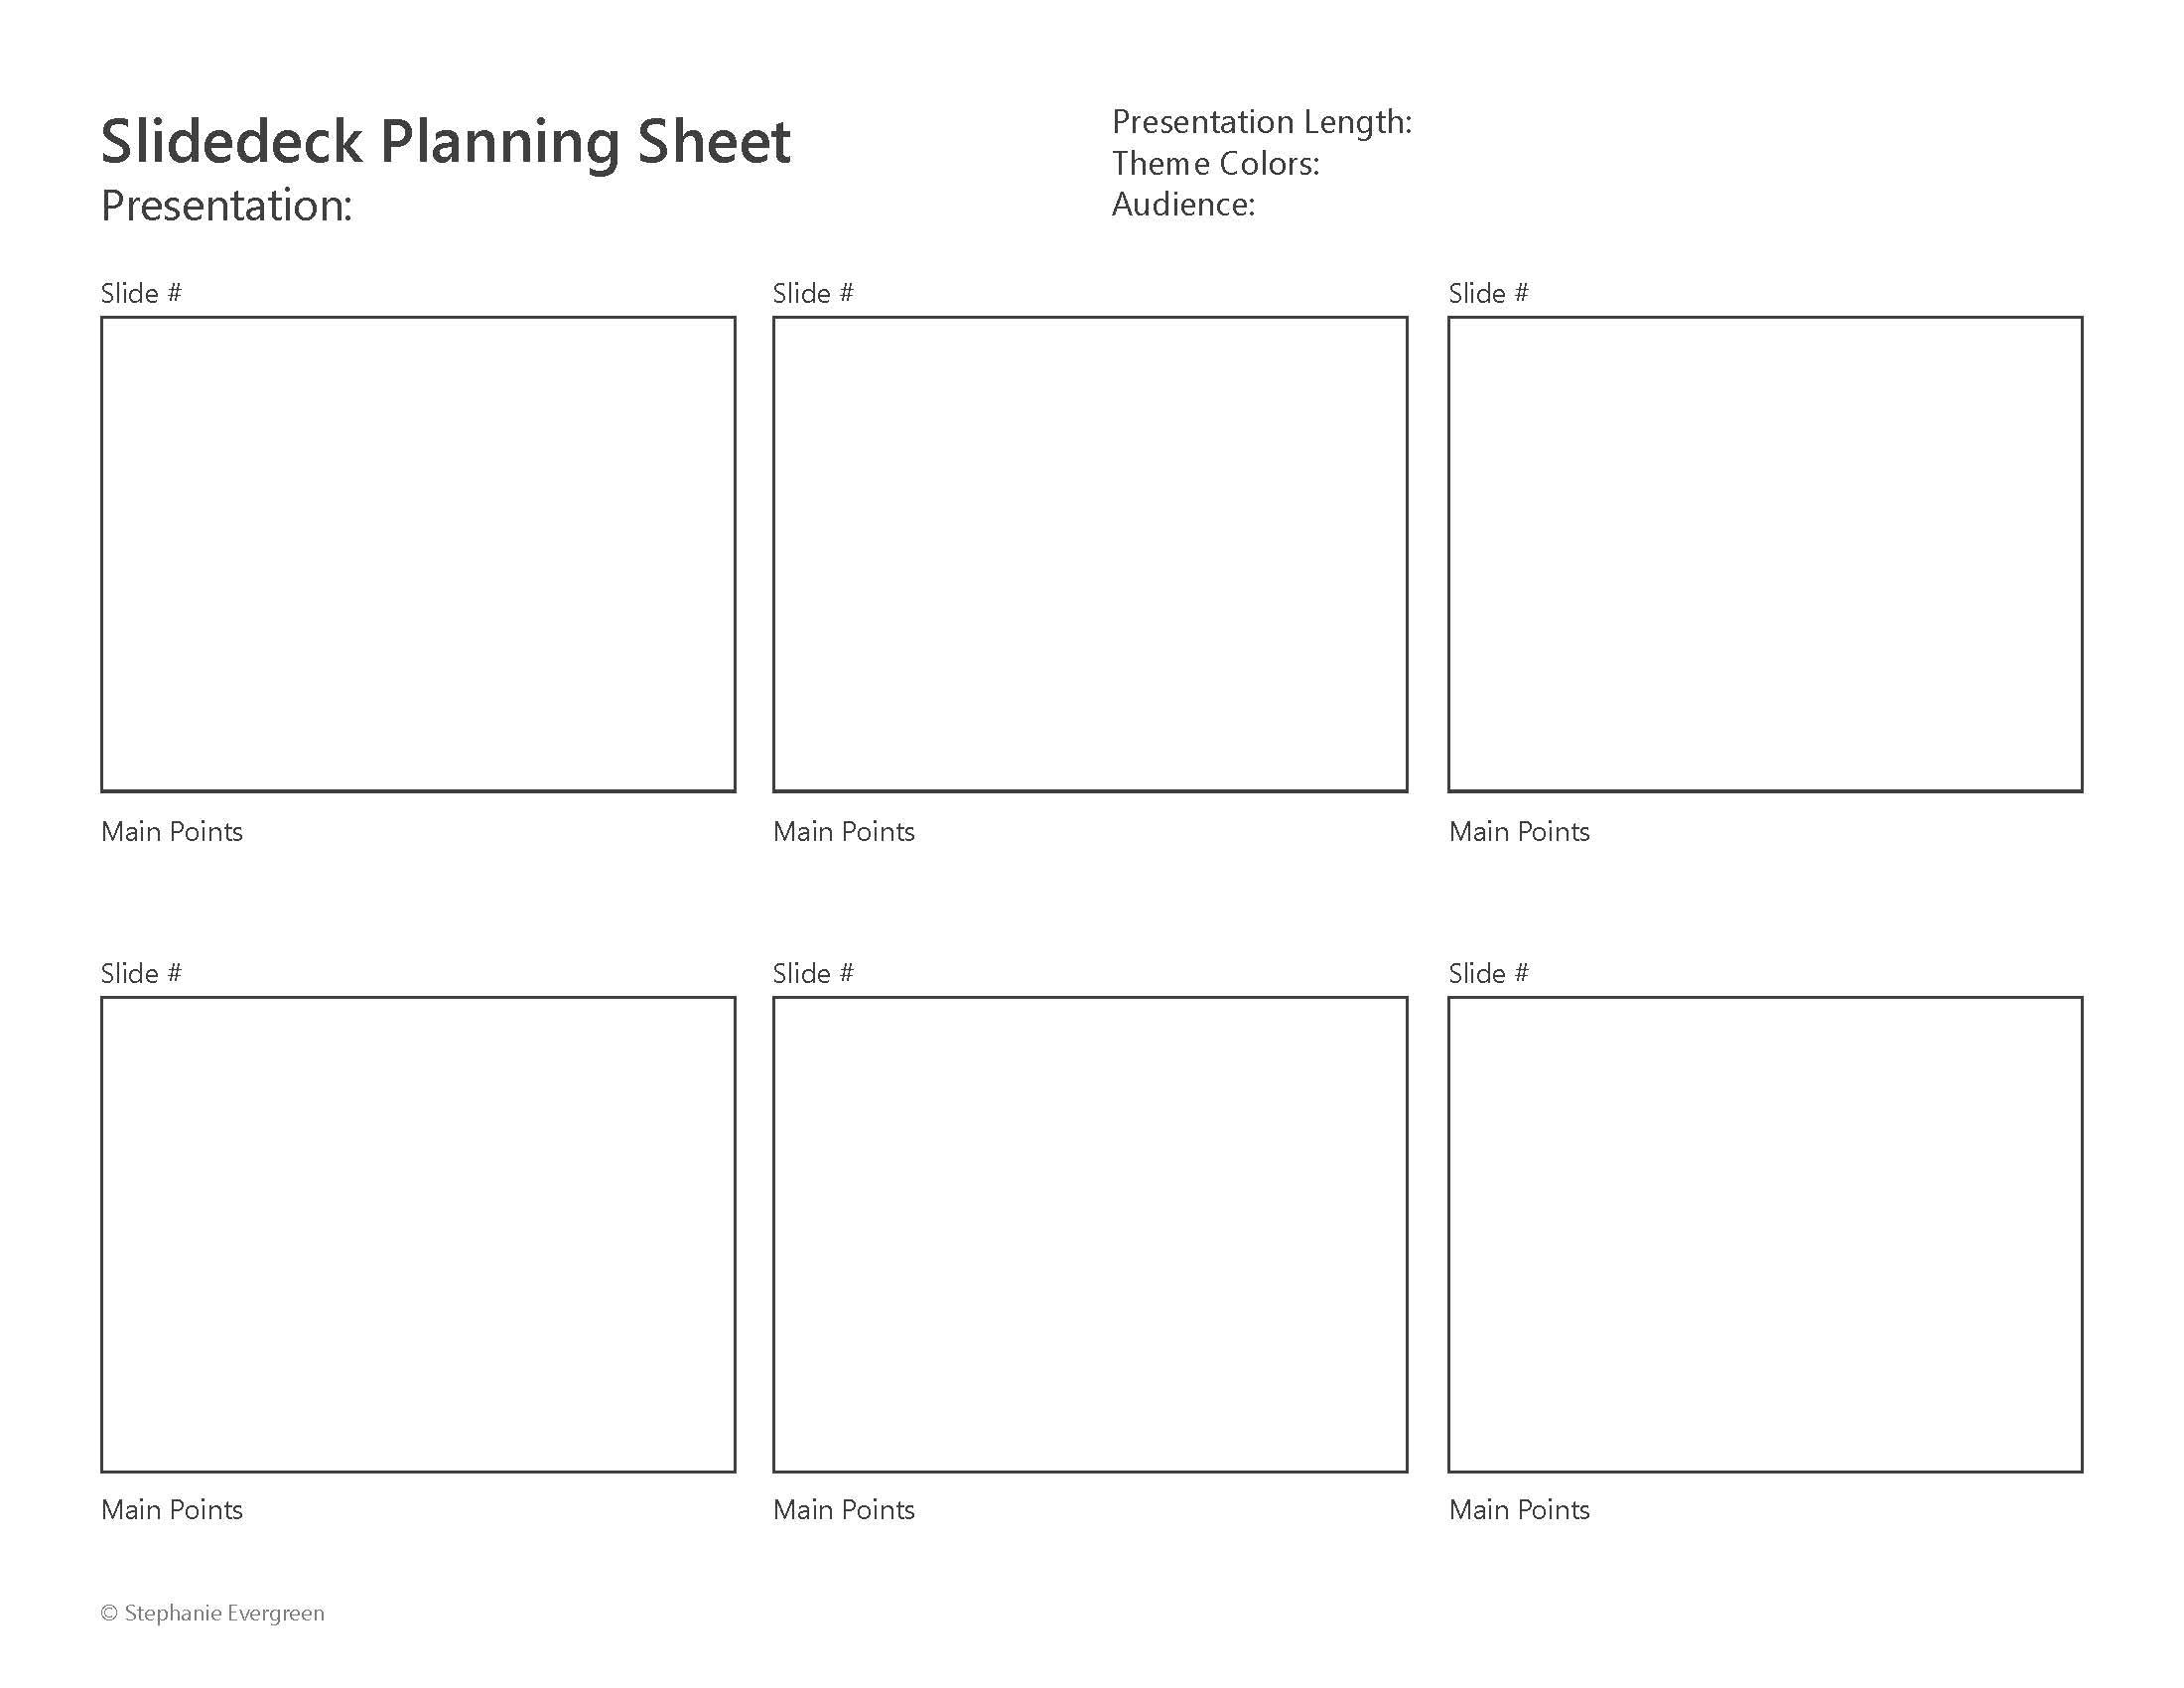 Slidedeck Planning Sheet